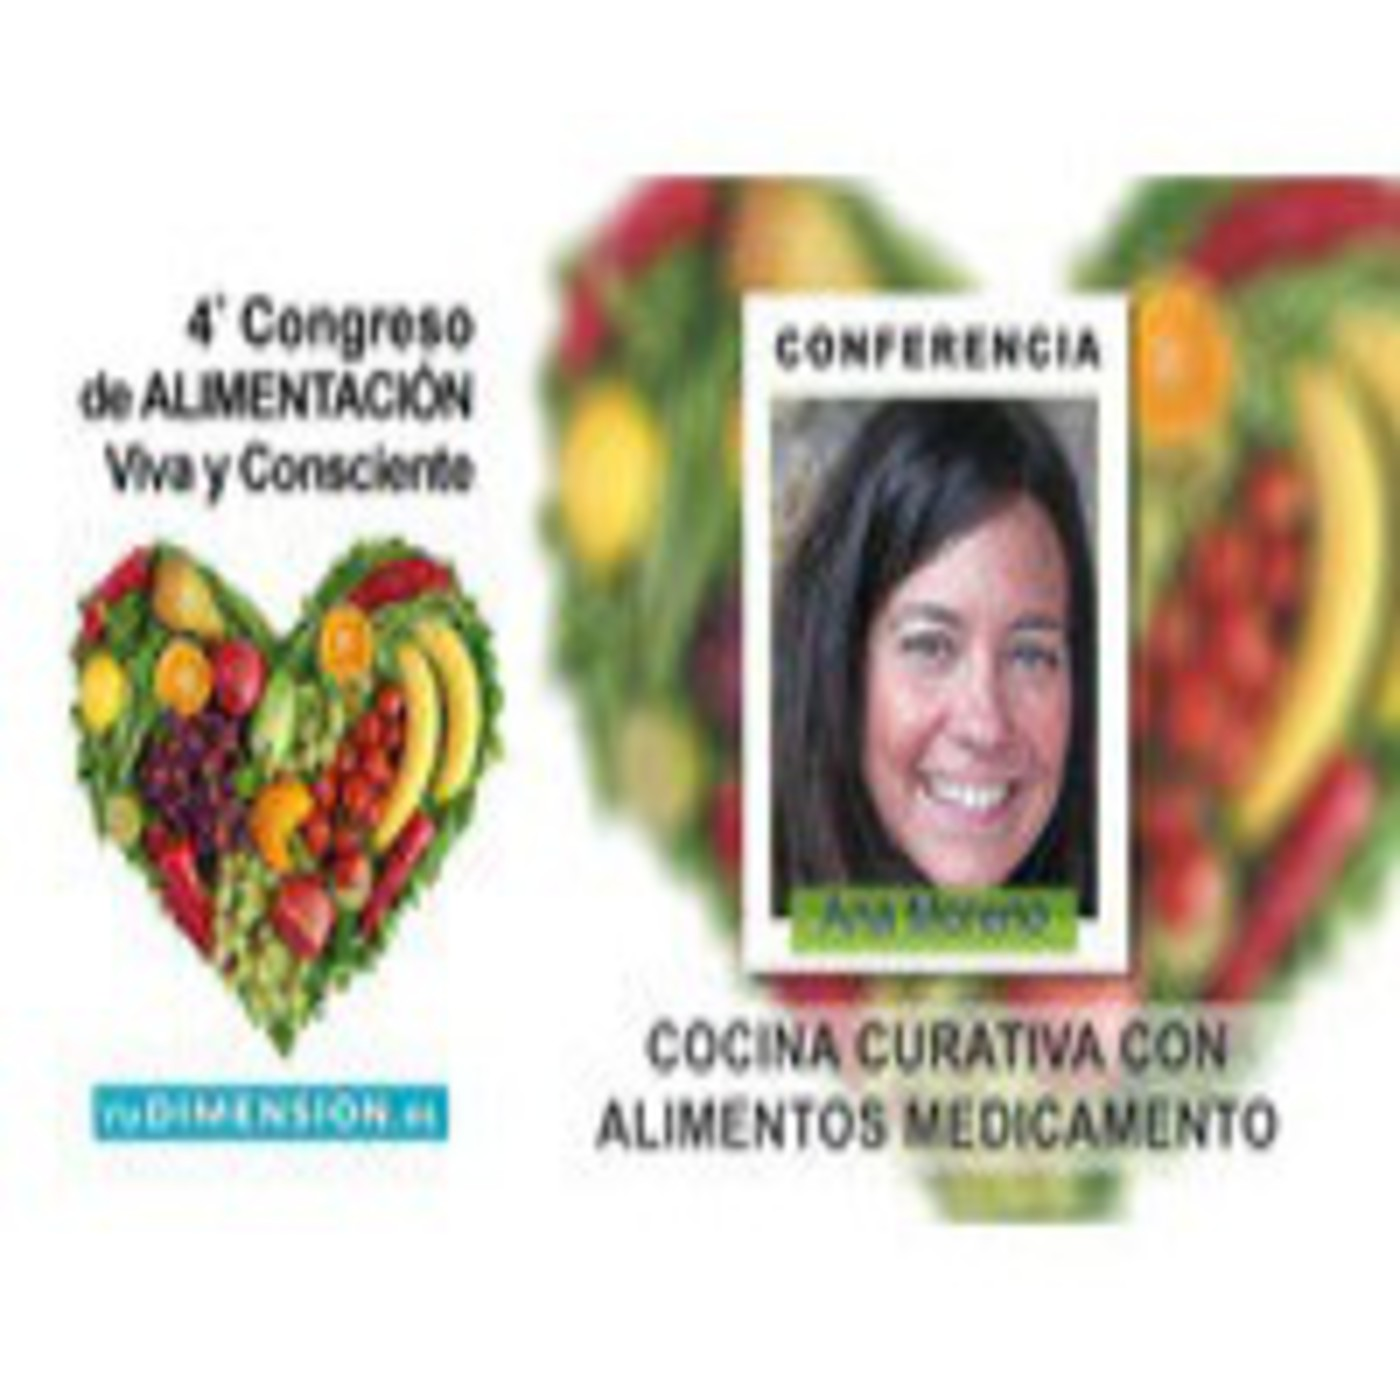 Cocina Curativa con Alimentos Medicamento - Conferencia de Ana Moreno